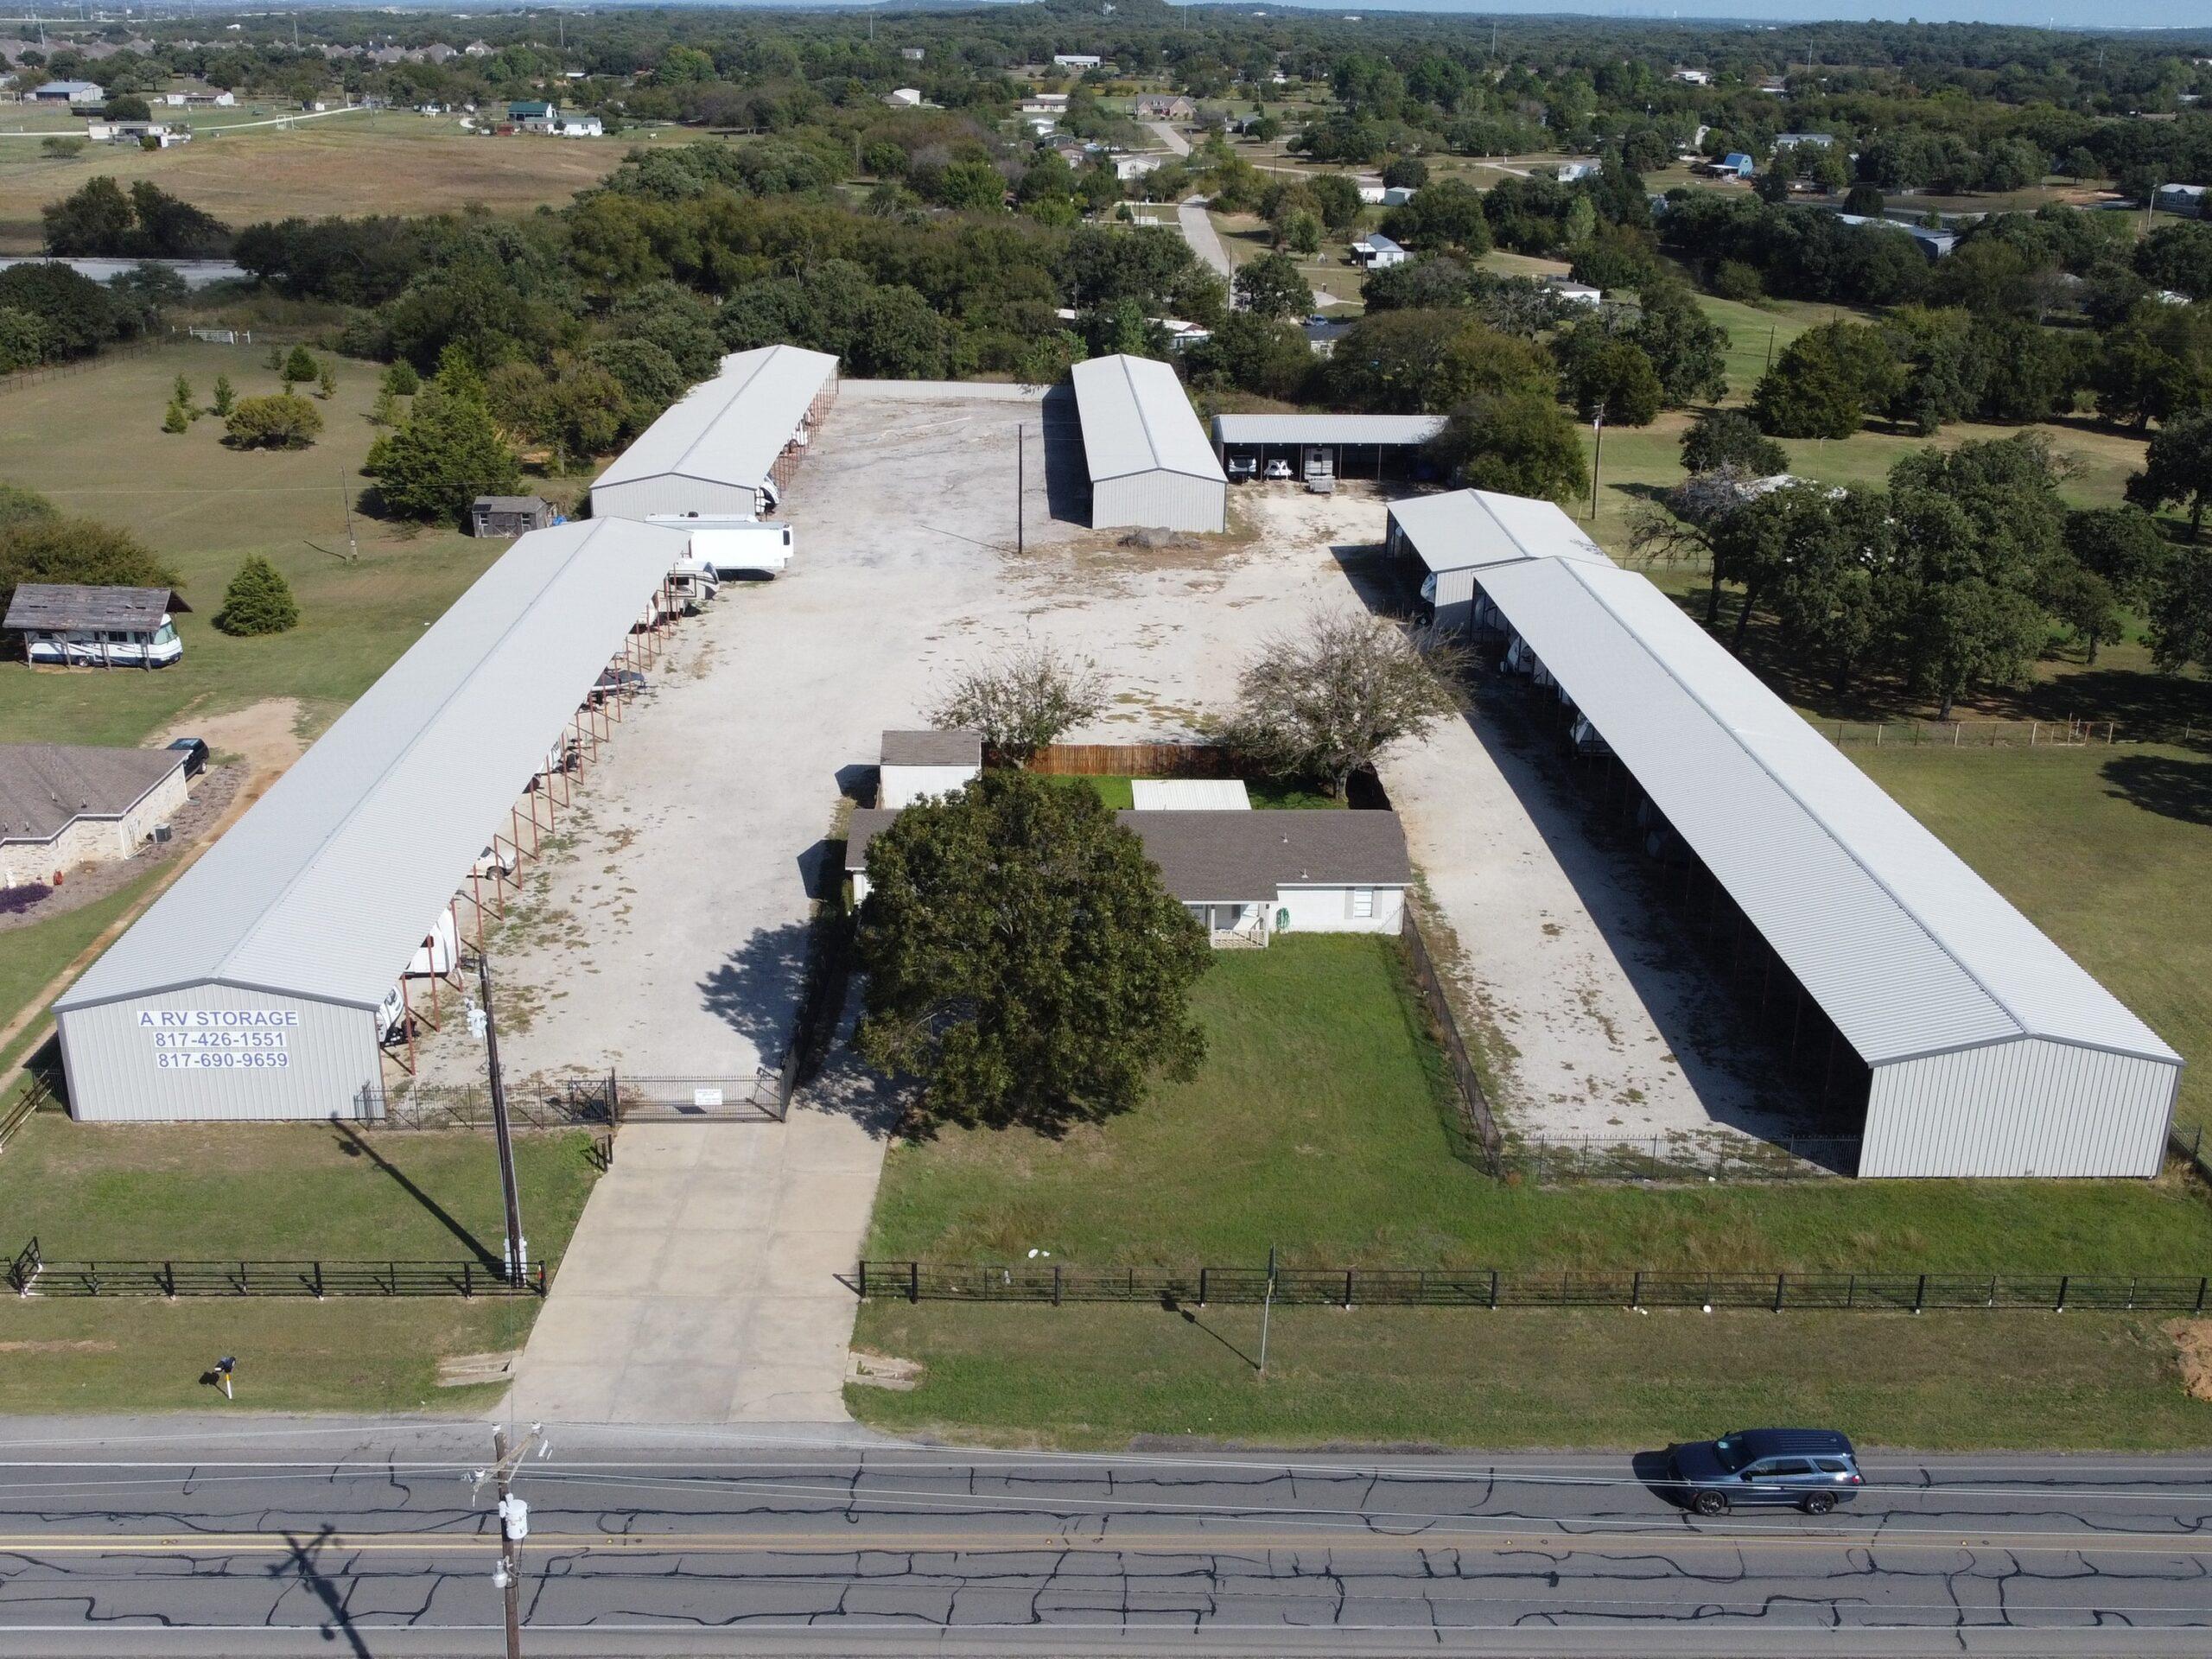 A RV Storage - Self Storage Facility For Sale in Texas by The Karr Self Storage Team